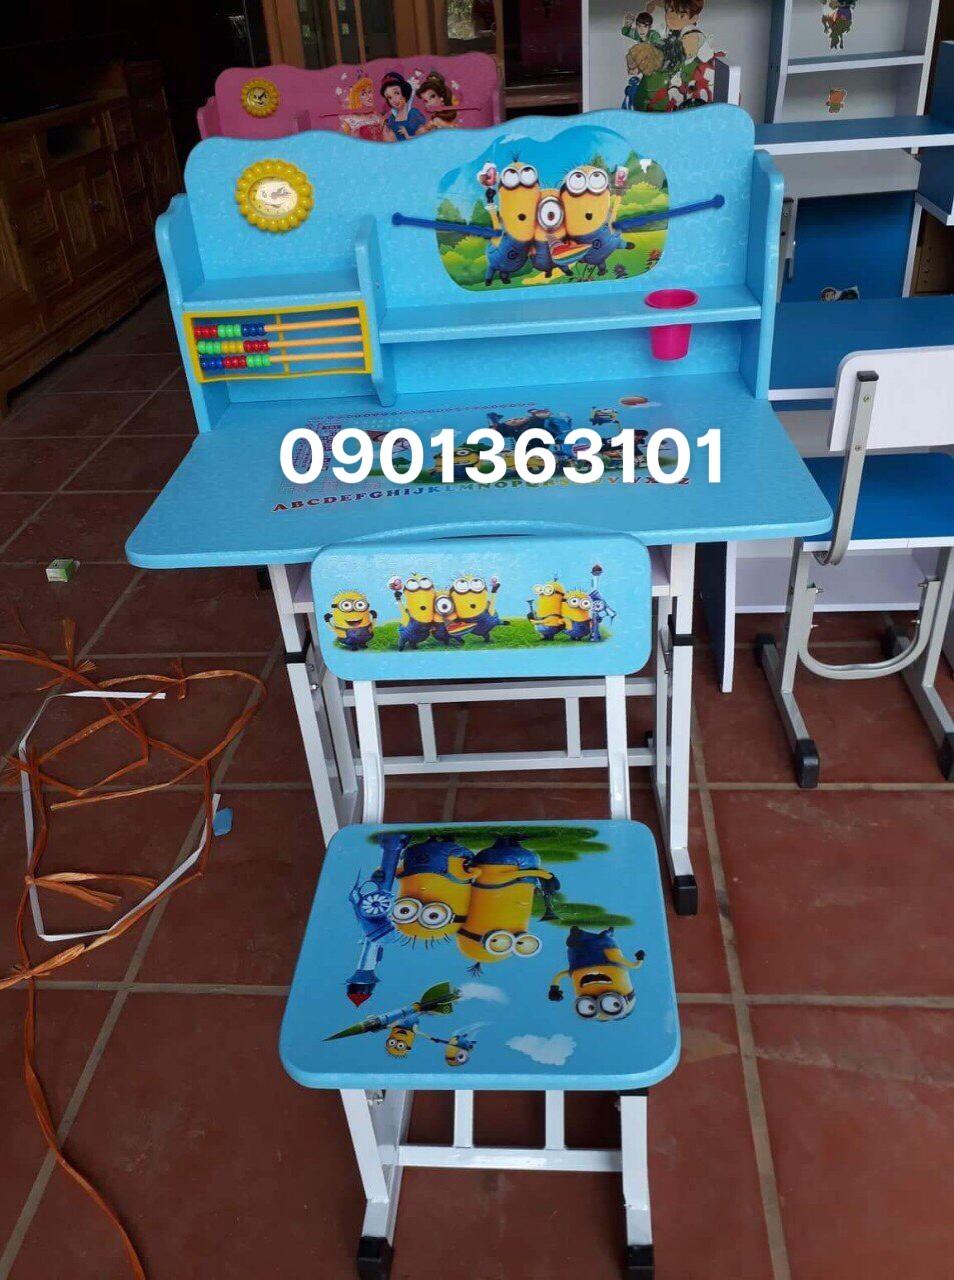 Z2450500504792 Ca52600491c9f741efd73ebfcb60bf33